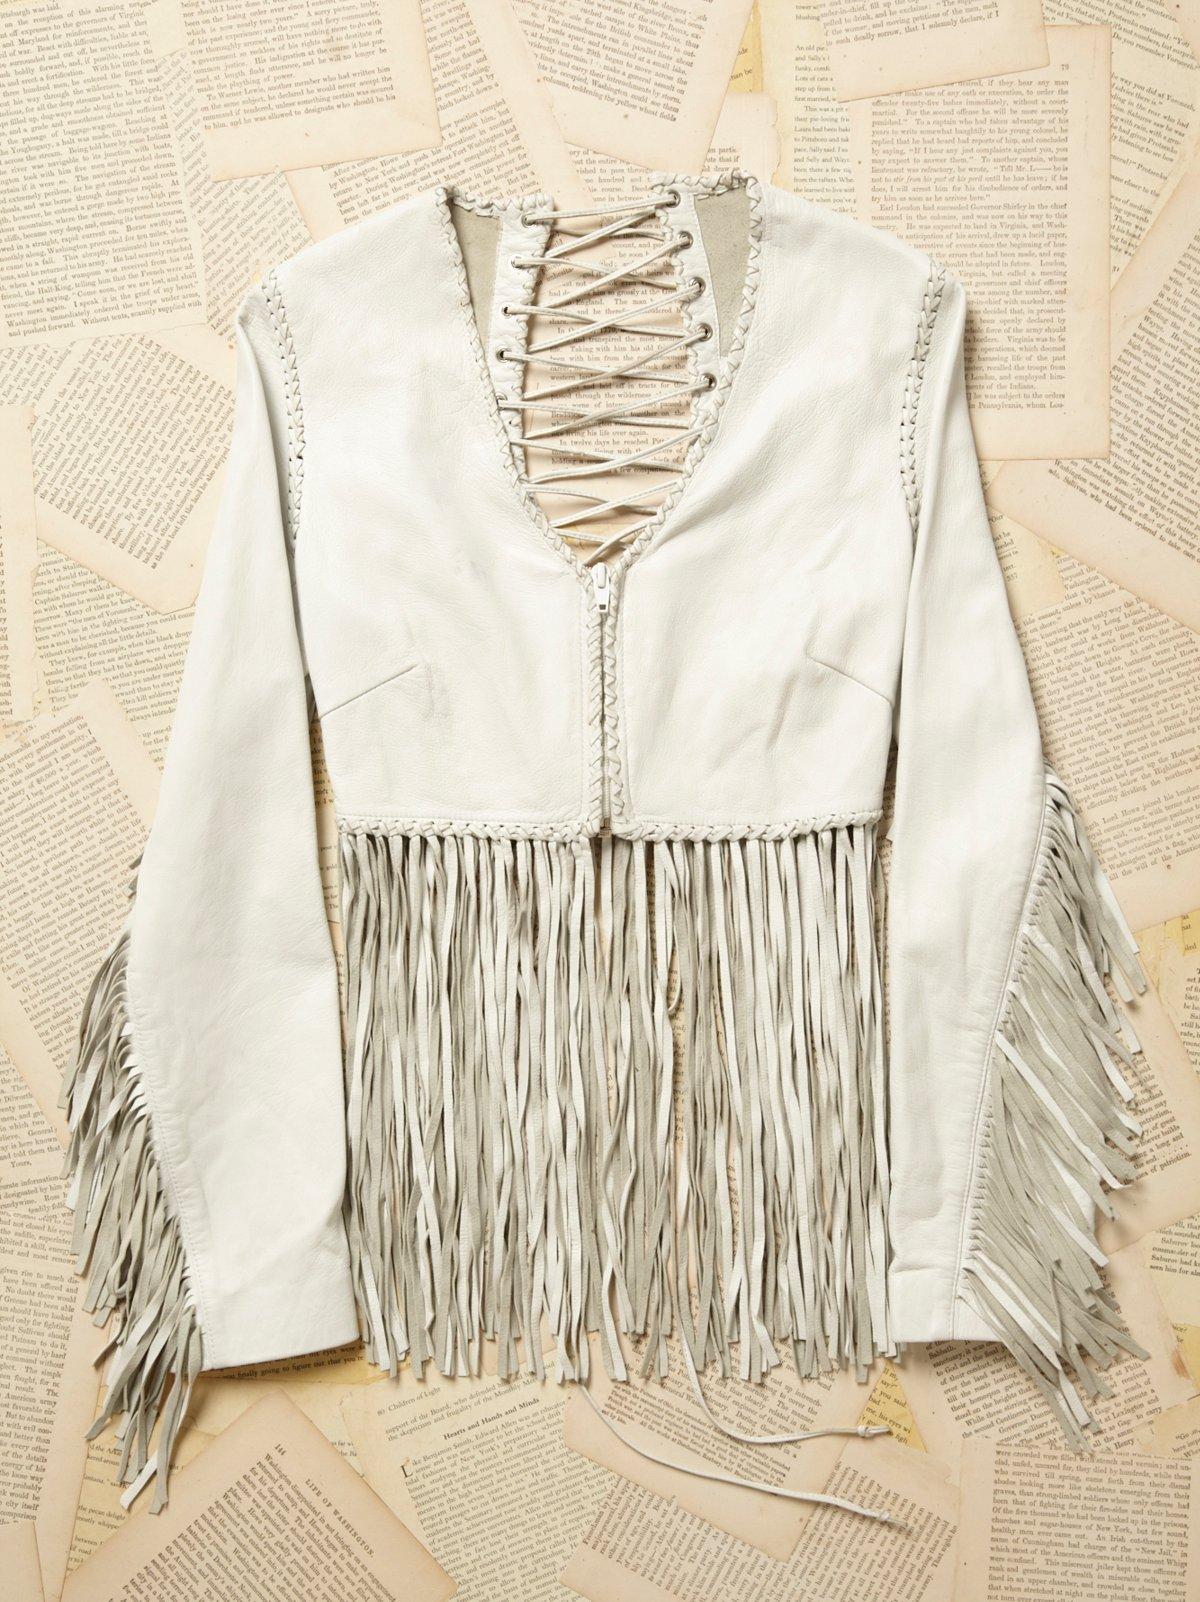 Vintage 1970s White Leather Lace Up Jacket